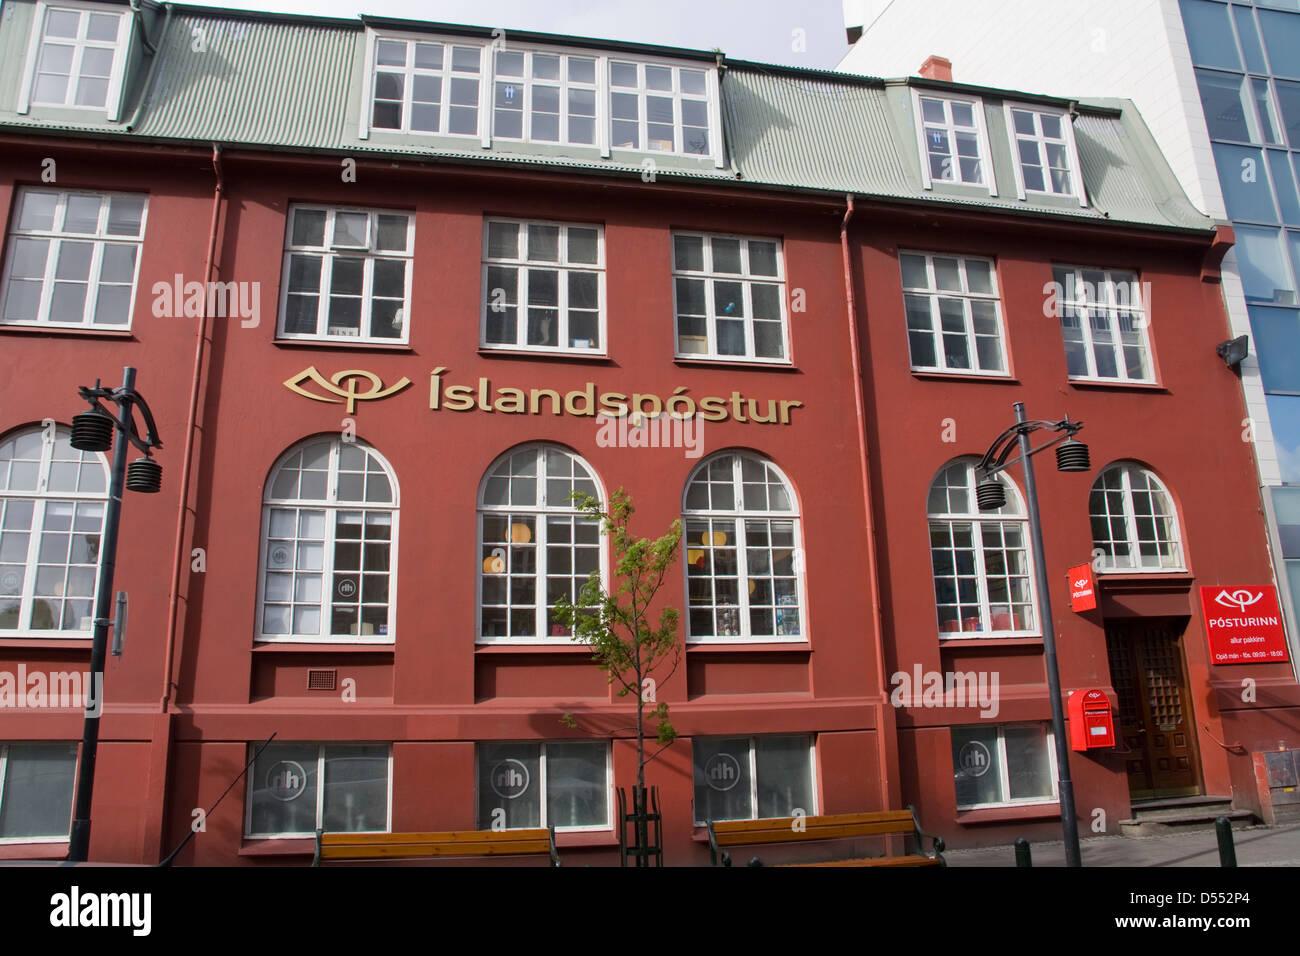 Iceland Reykjavik Postoffice building - Stock Image